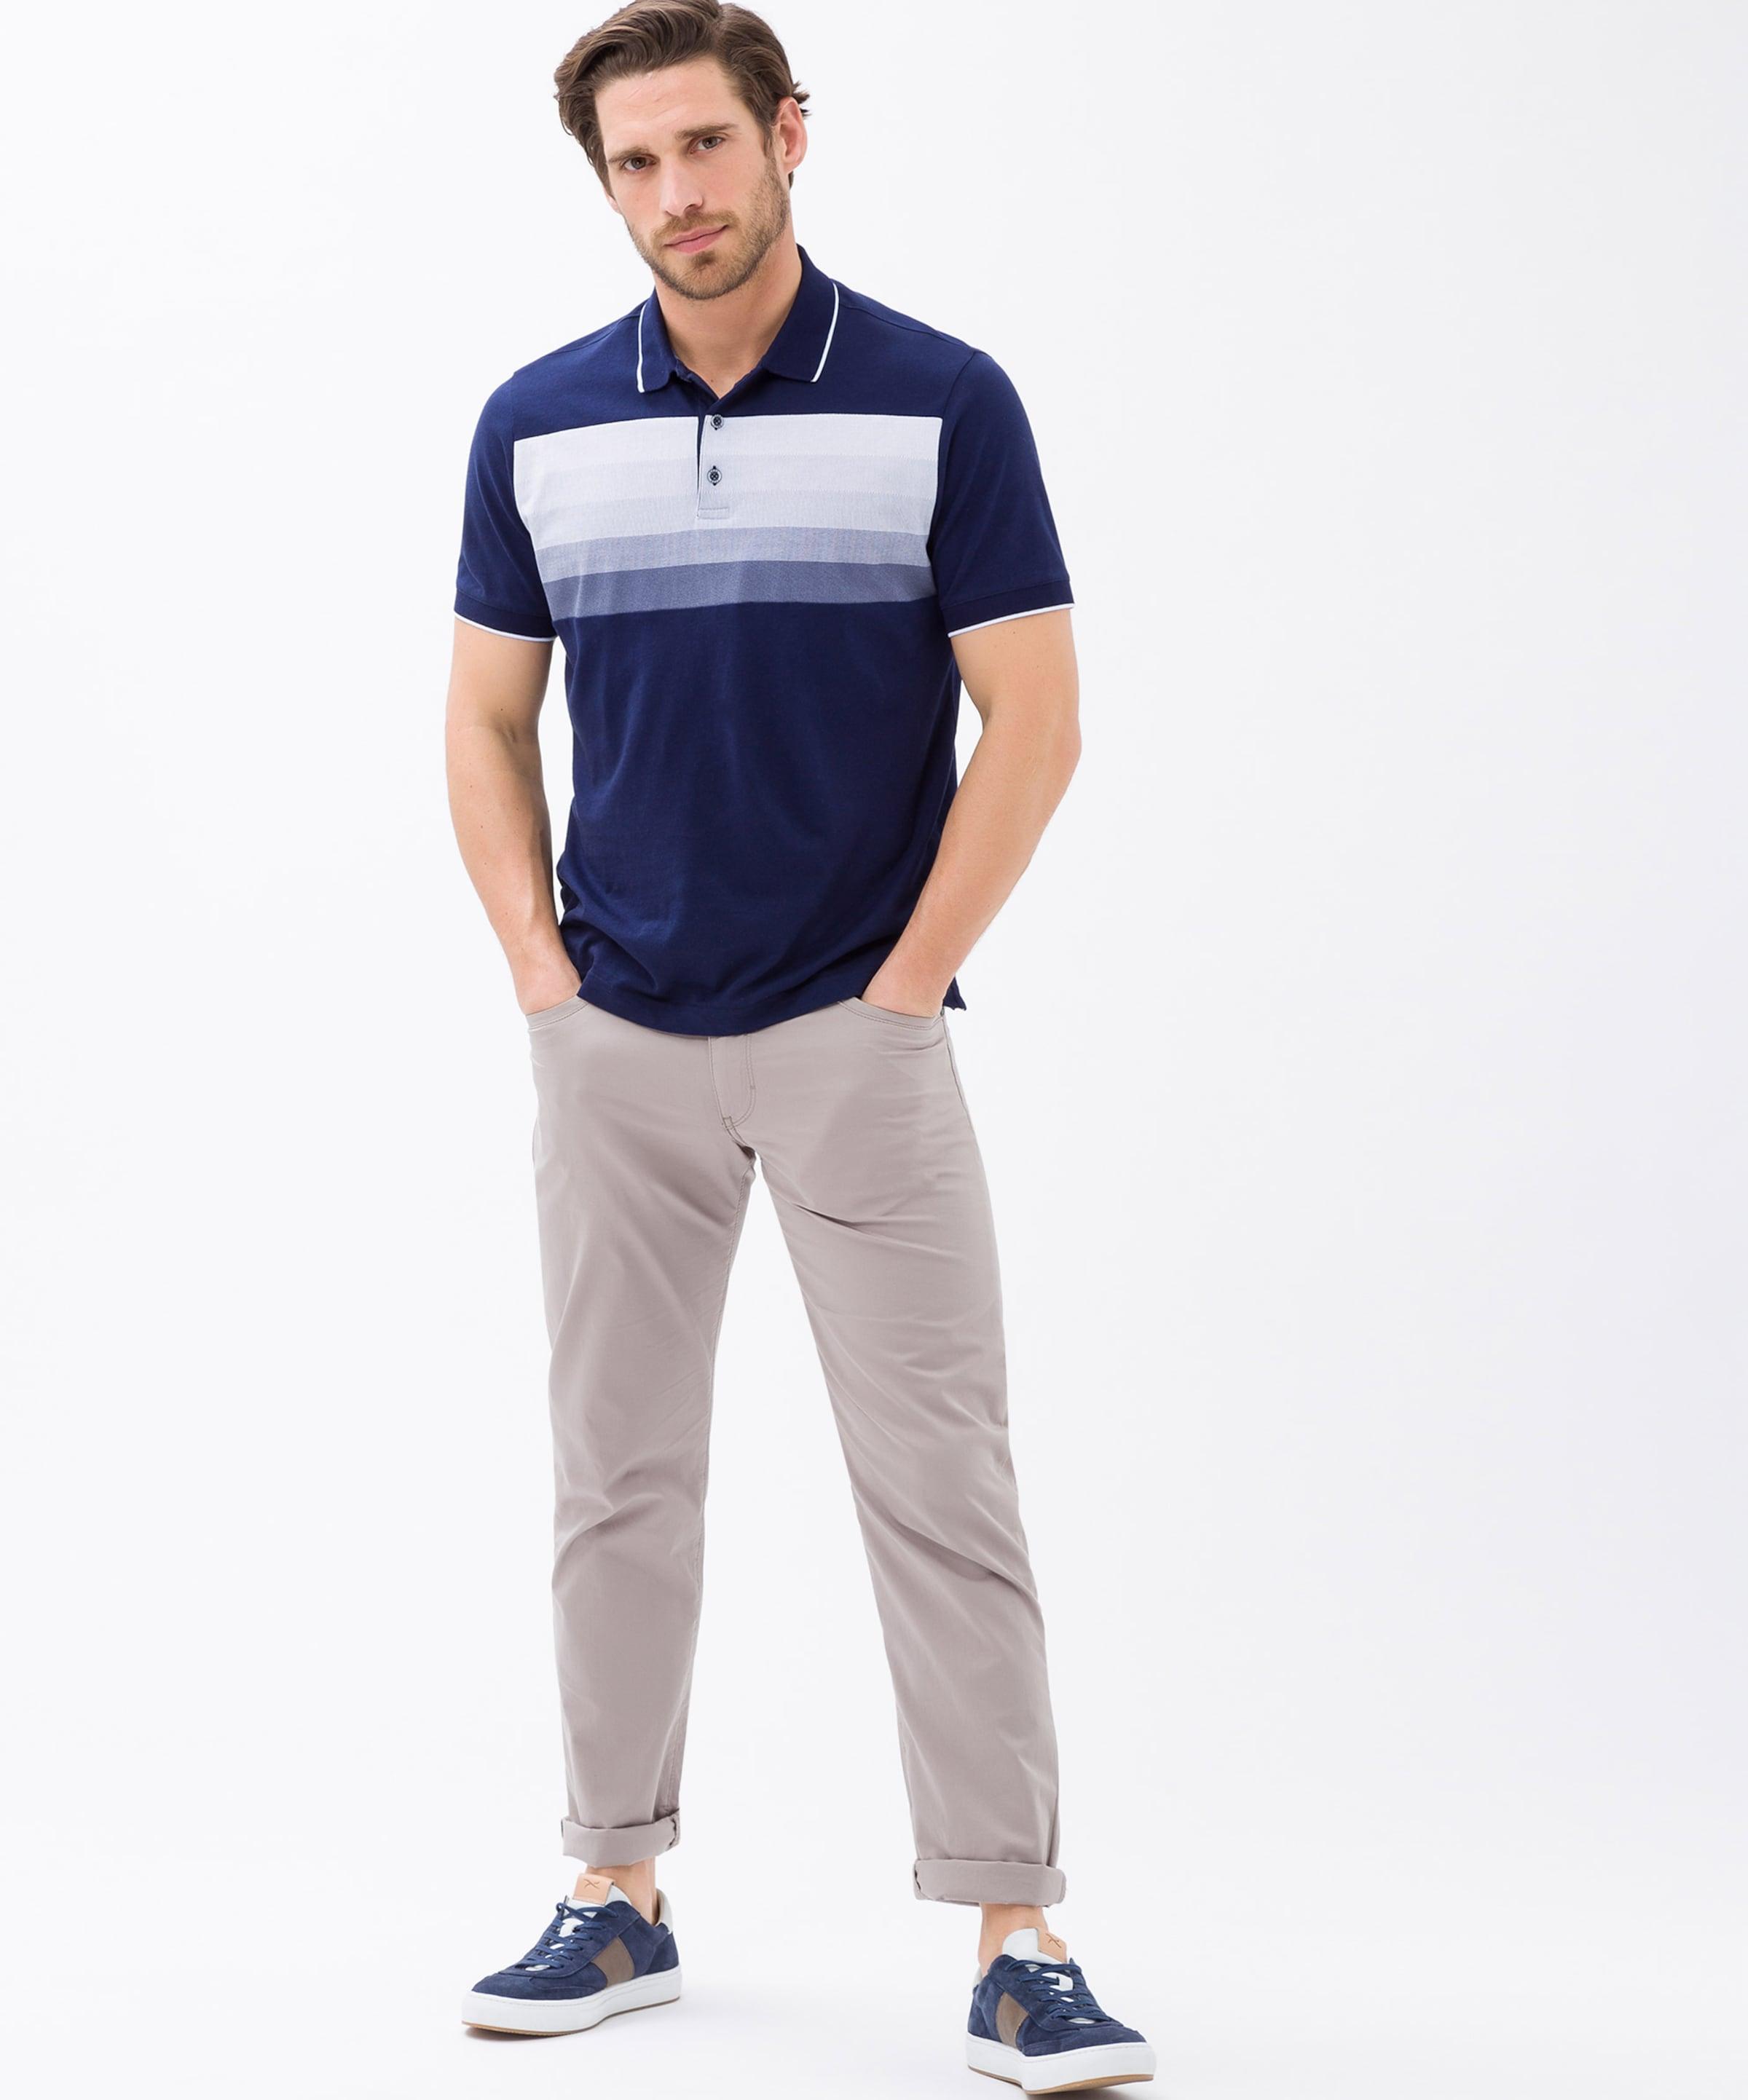 'parker' NavyTaubenblau Brax Poloshirt In Weiß RjLA54